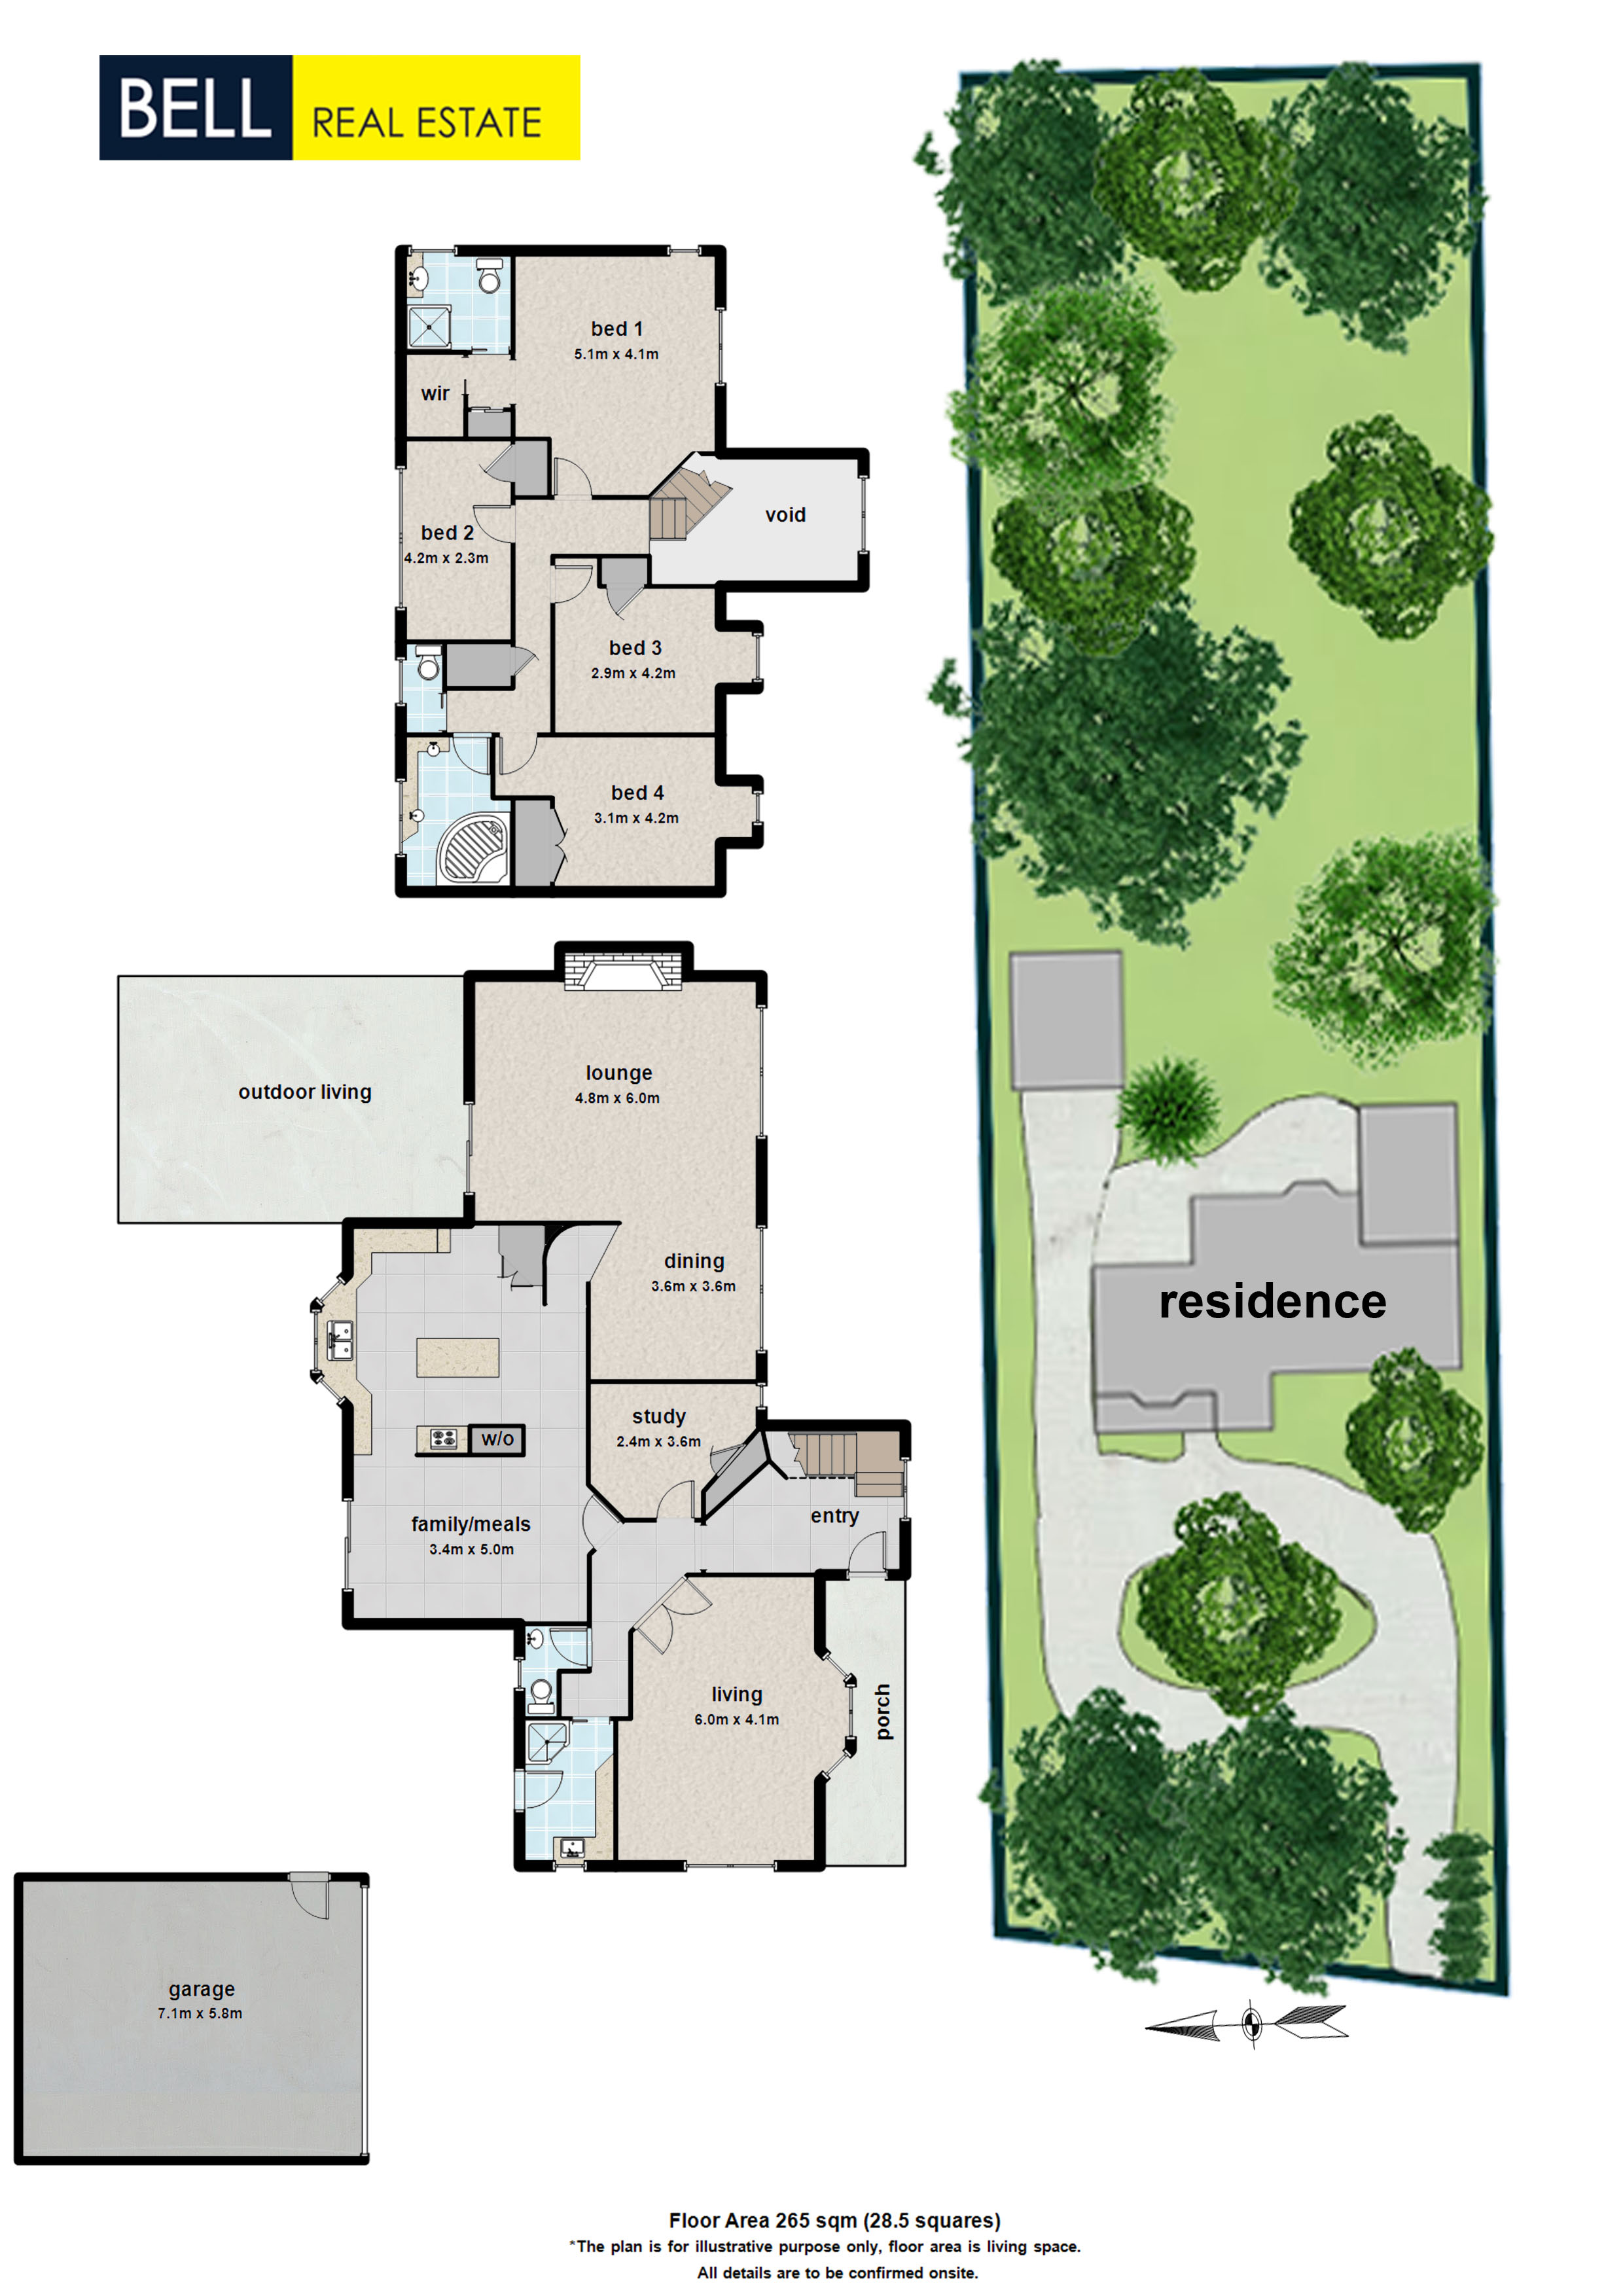 https://assets.boxdice.com.au/bell_re/listings/17925/7e6fe49b.jpg